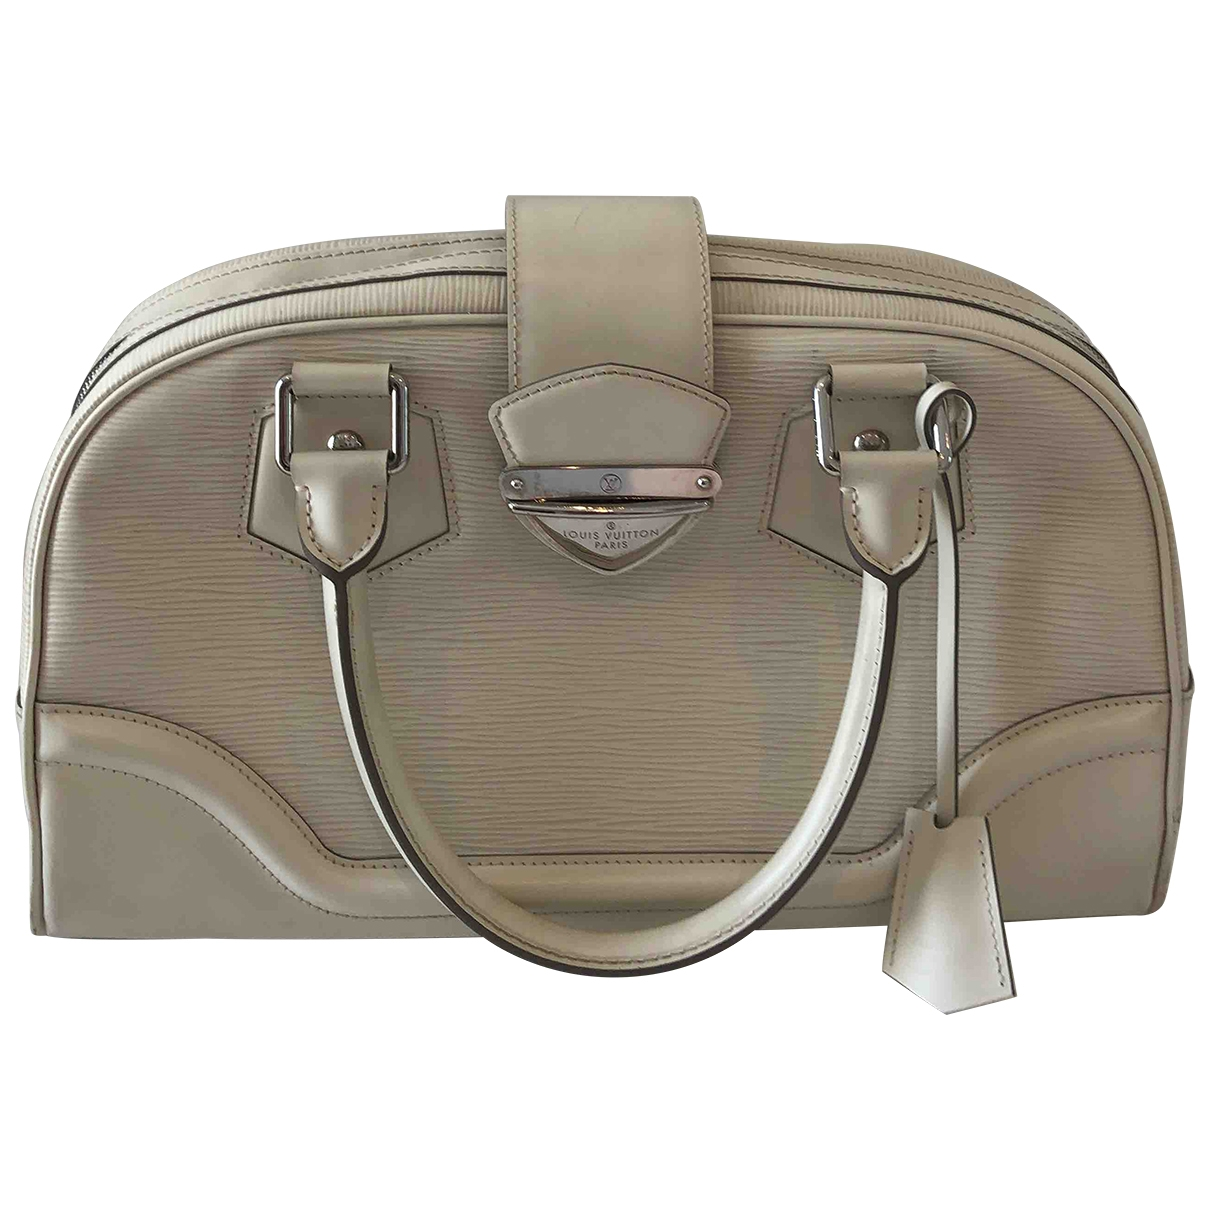 Bolso  Montaigne Vintage  de Cuero Louis Vuitton